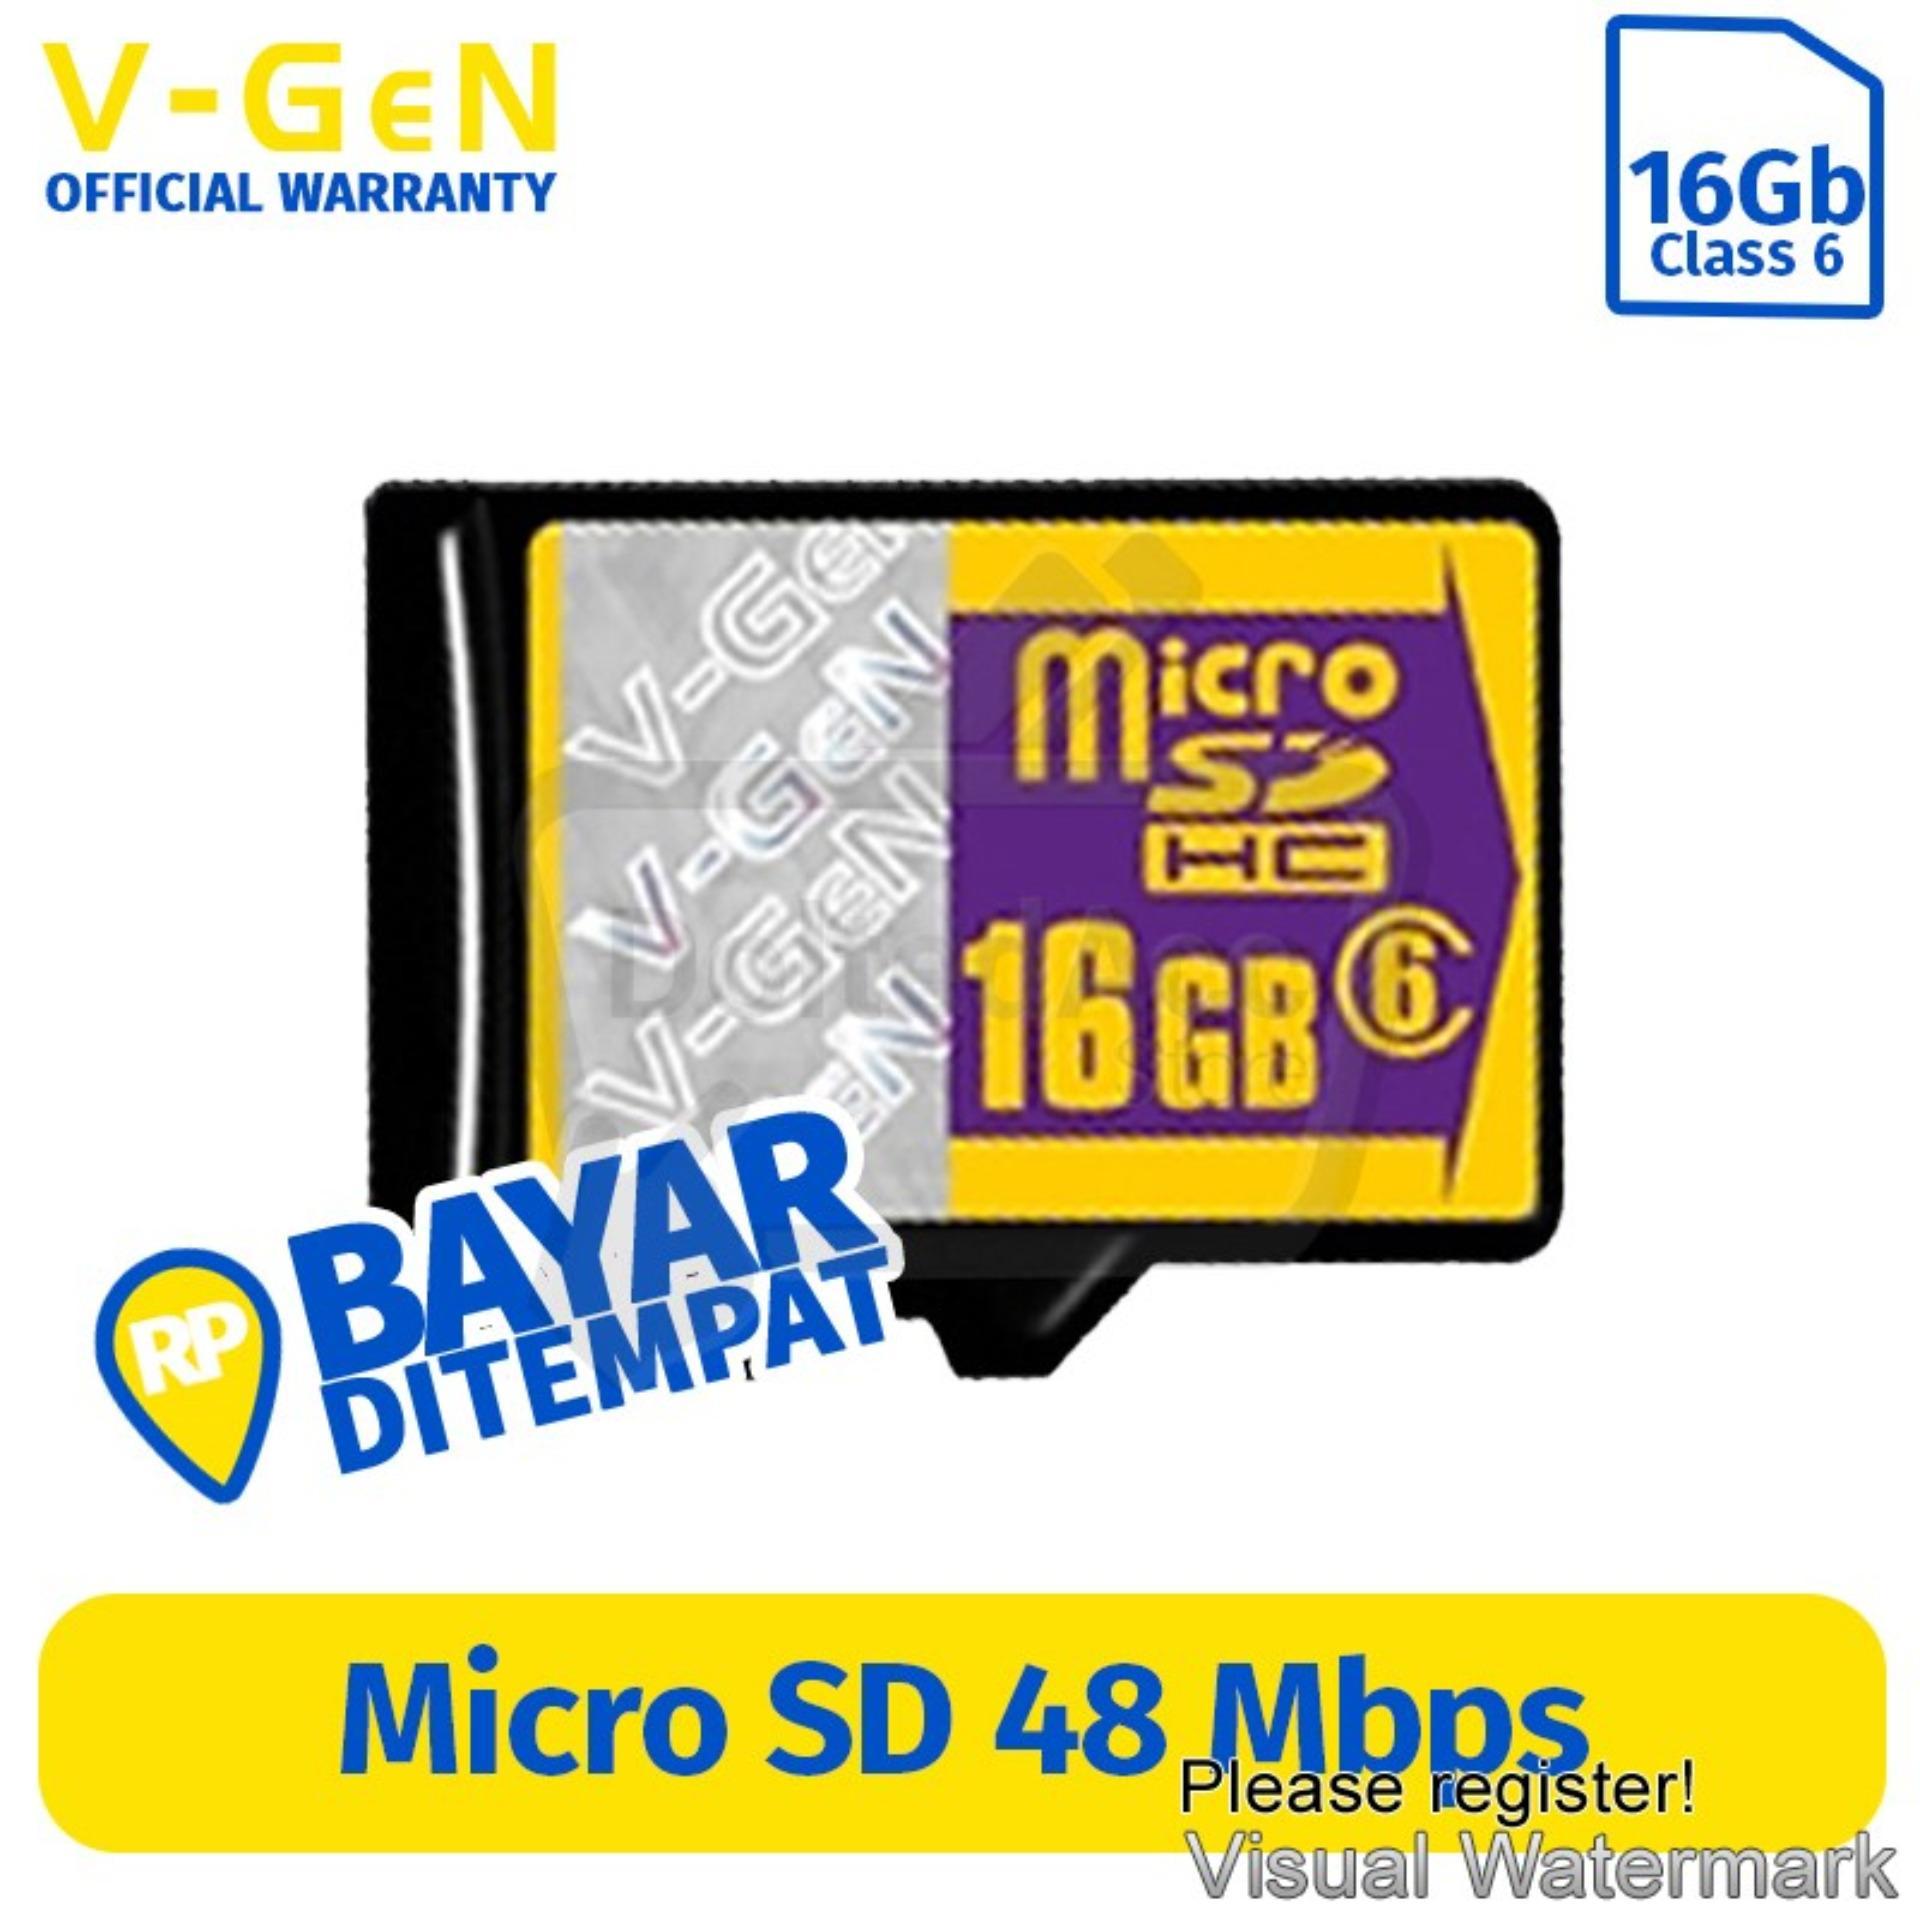 Kelebihan Marintri Memory Card 4 Gb V Gen Terkini Daftar Harga Dan Sdhc 4gb Micro Sd 16gb Class 6 16